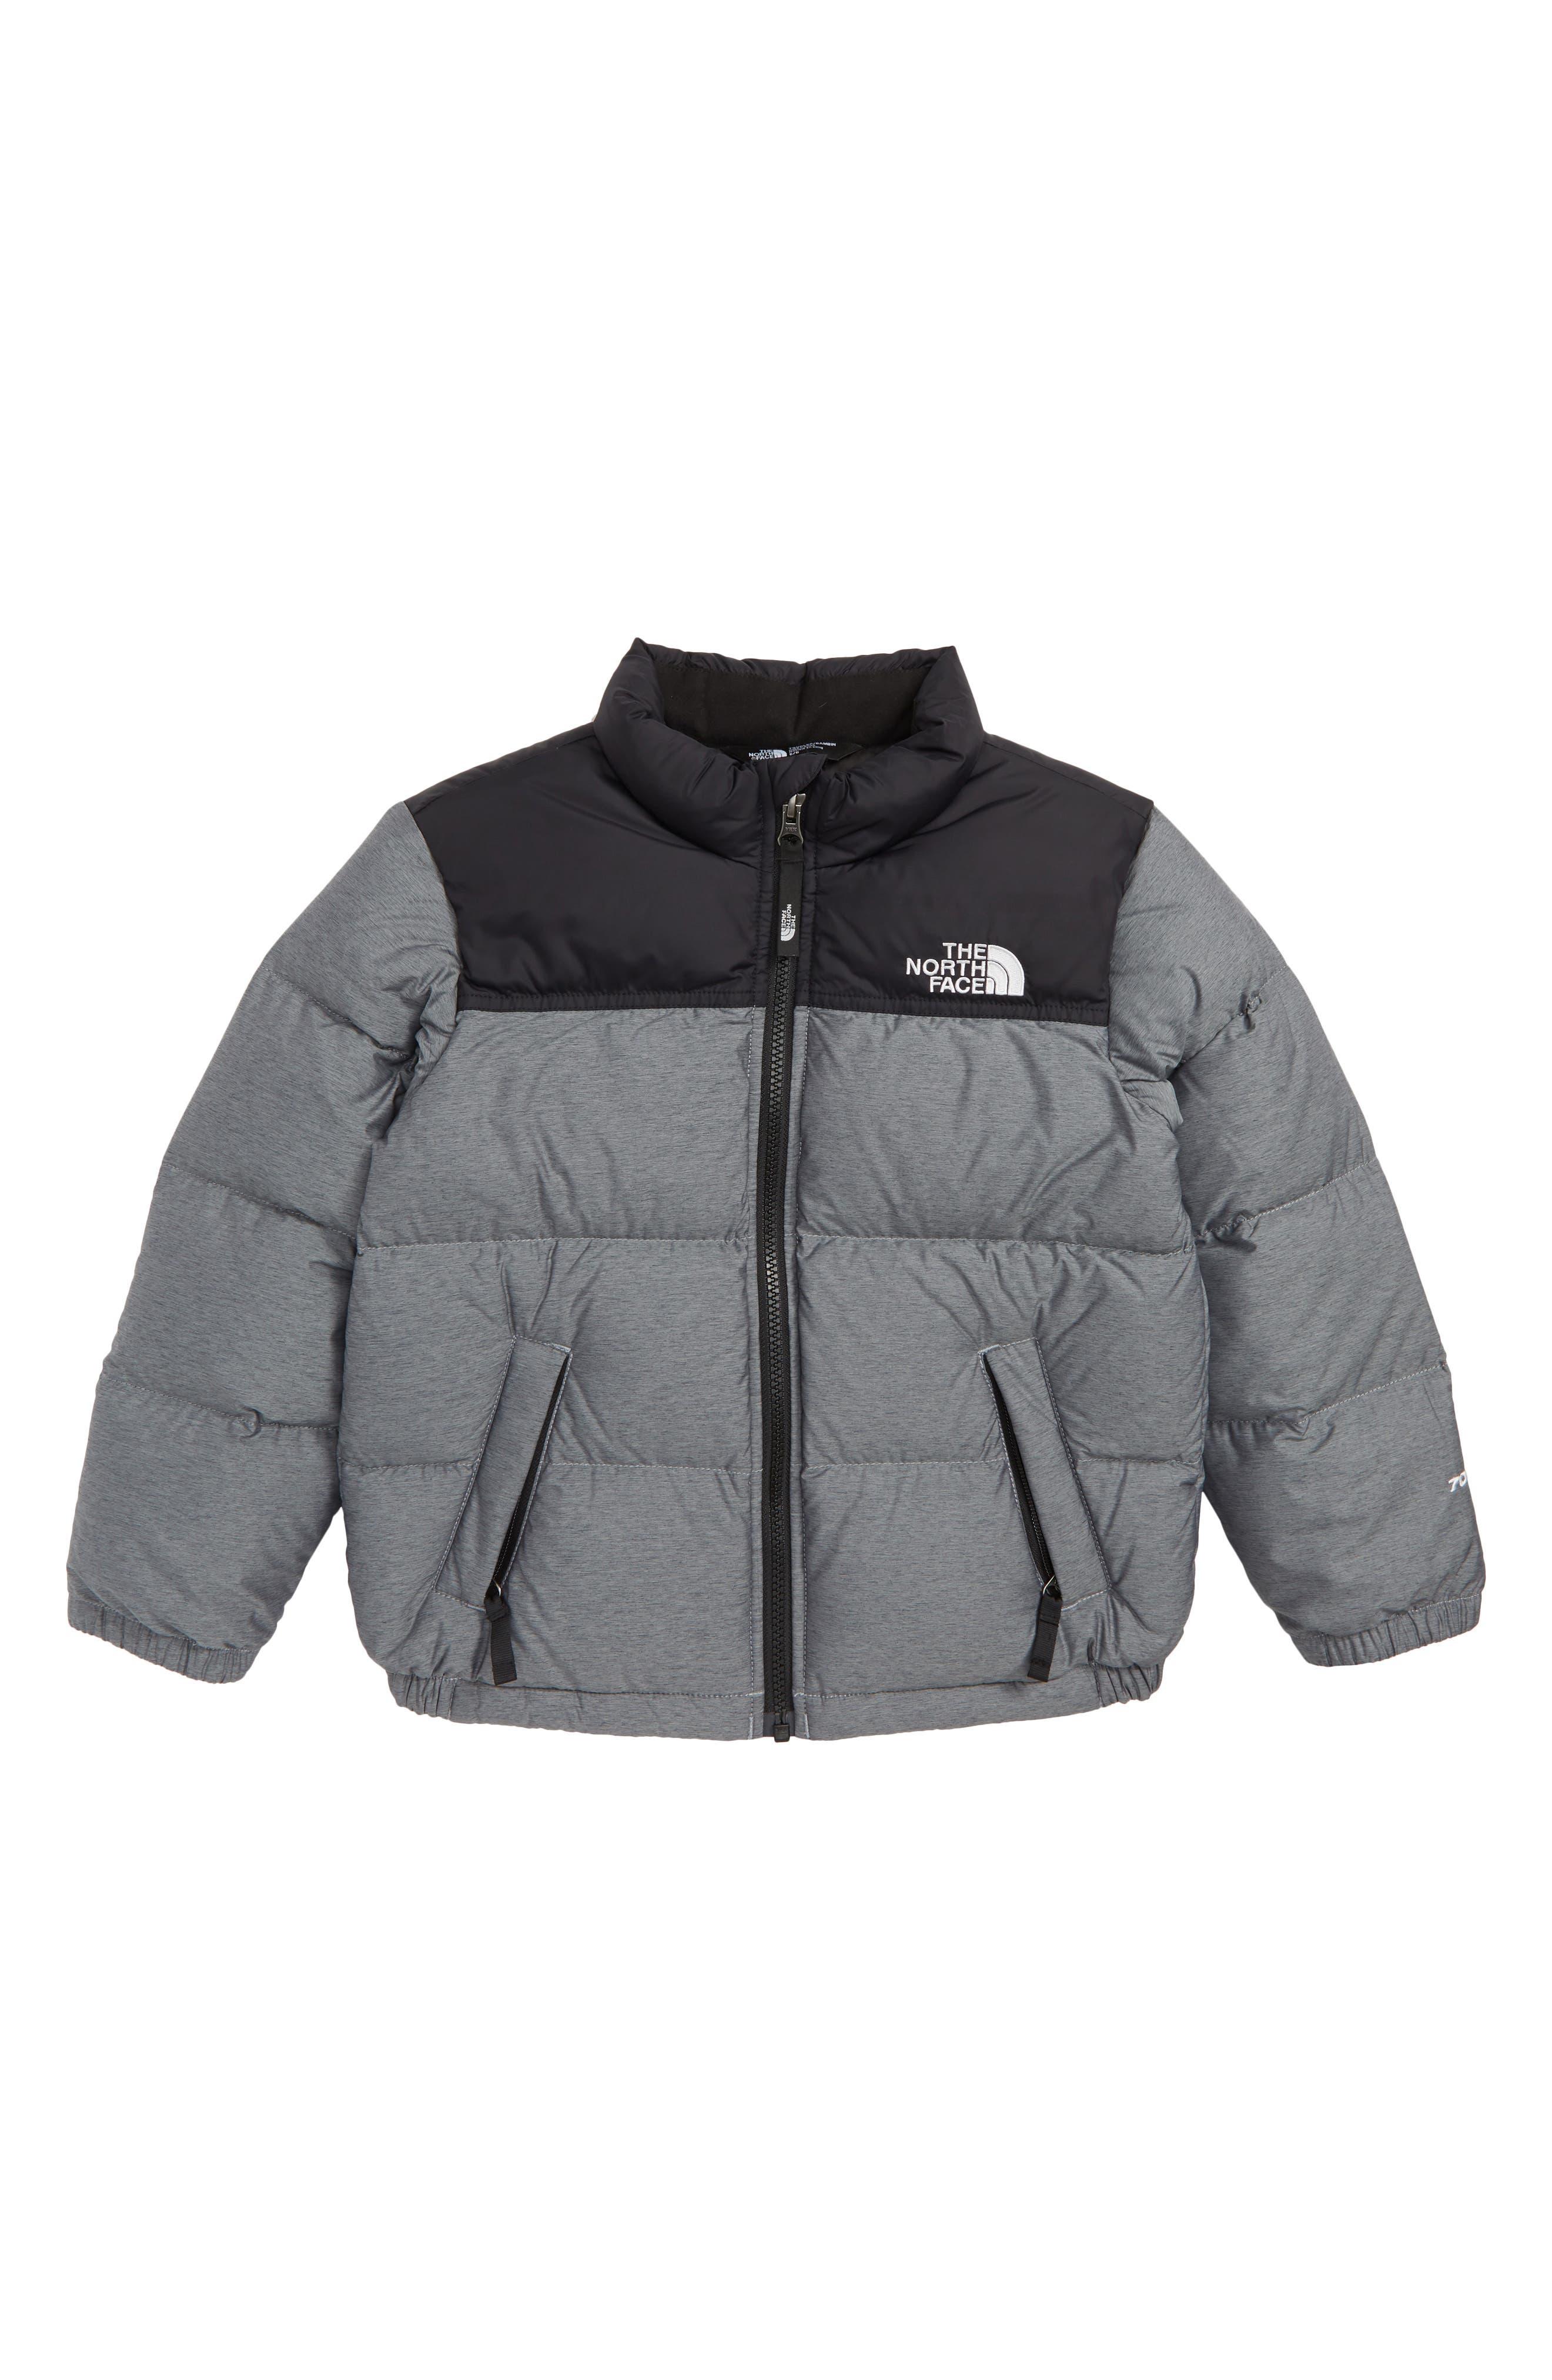 Nuptse 700 Fill Power Down Jacket, Main, color, 030